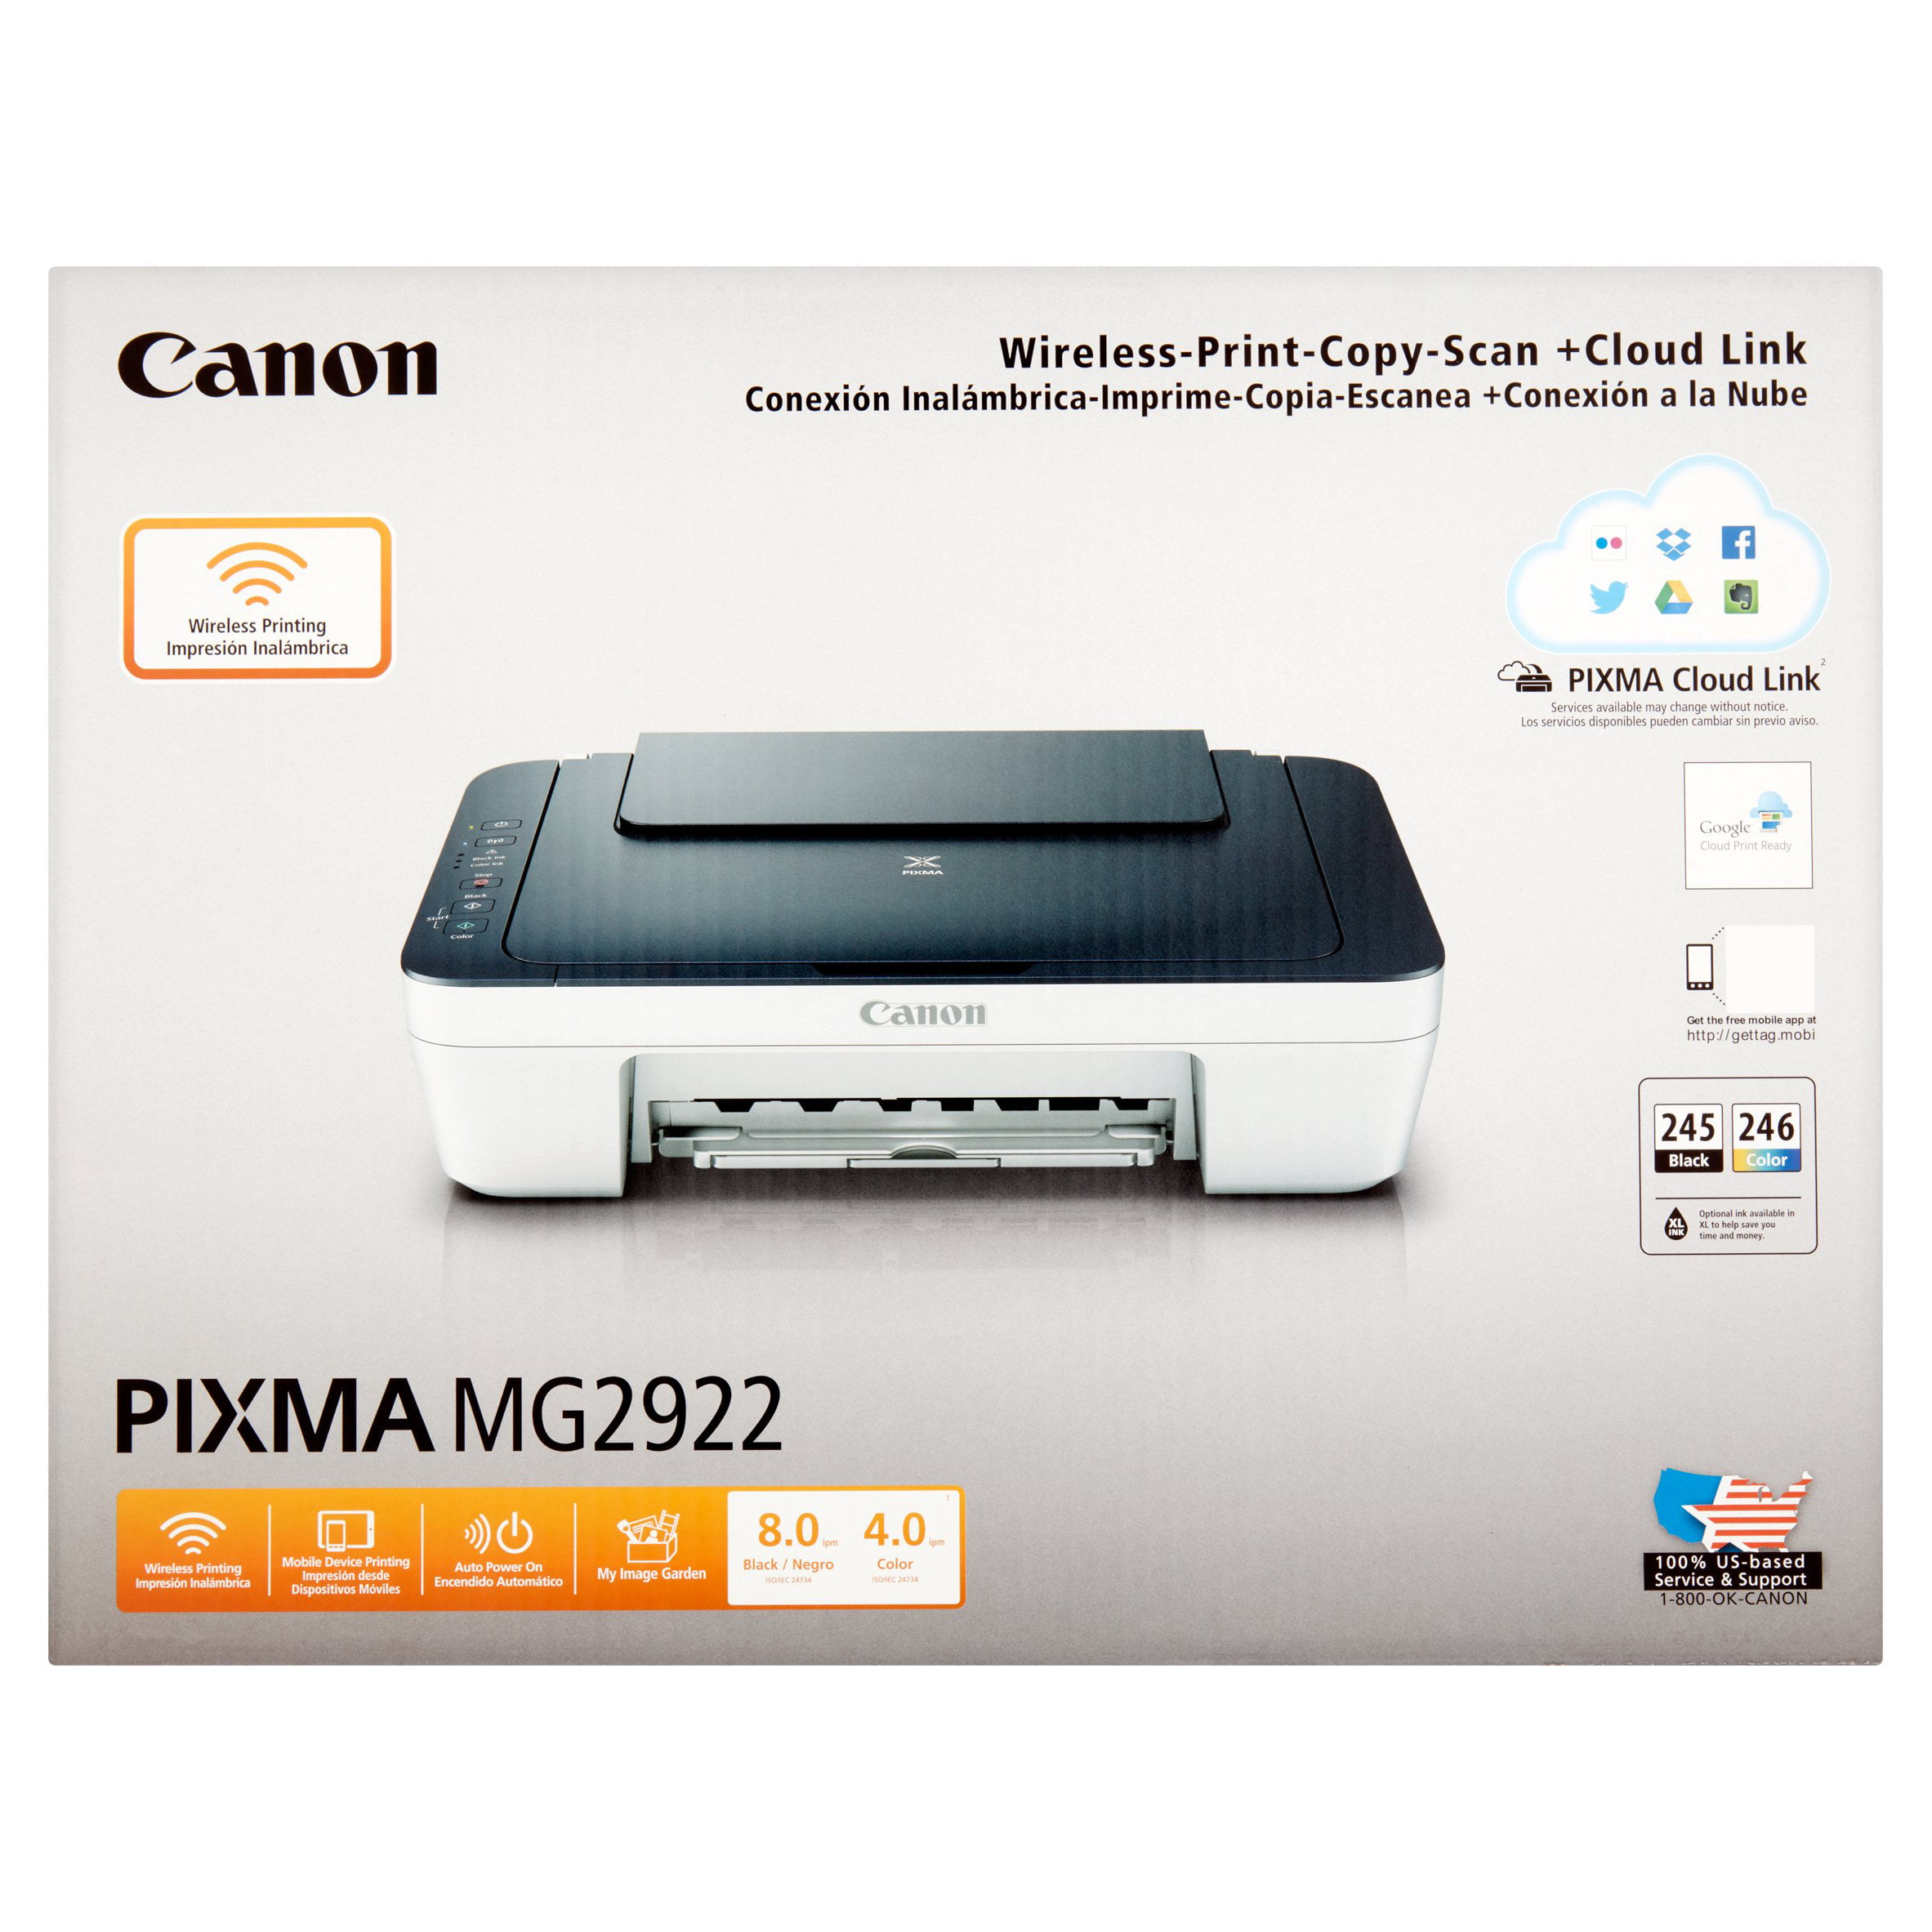 MX-450 Easy Programming Guide. Canon PIXMA MG2922 - multifunction printer  (color) - Walmart.com